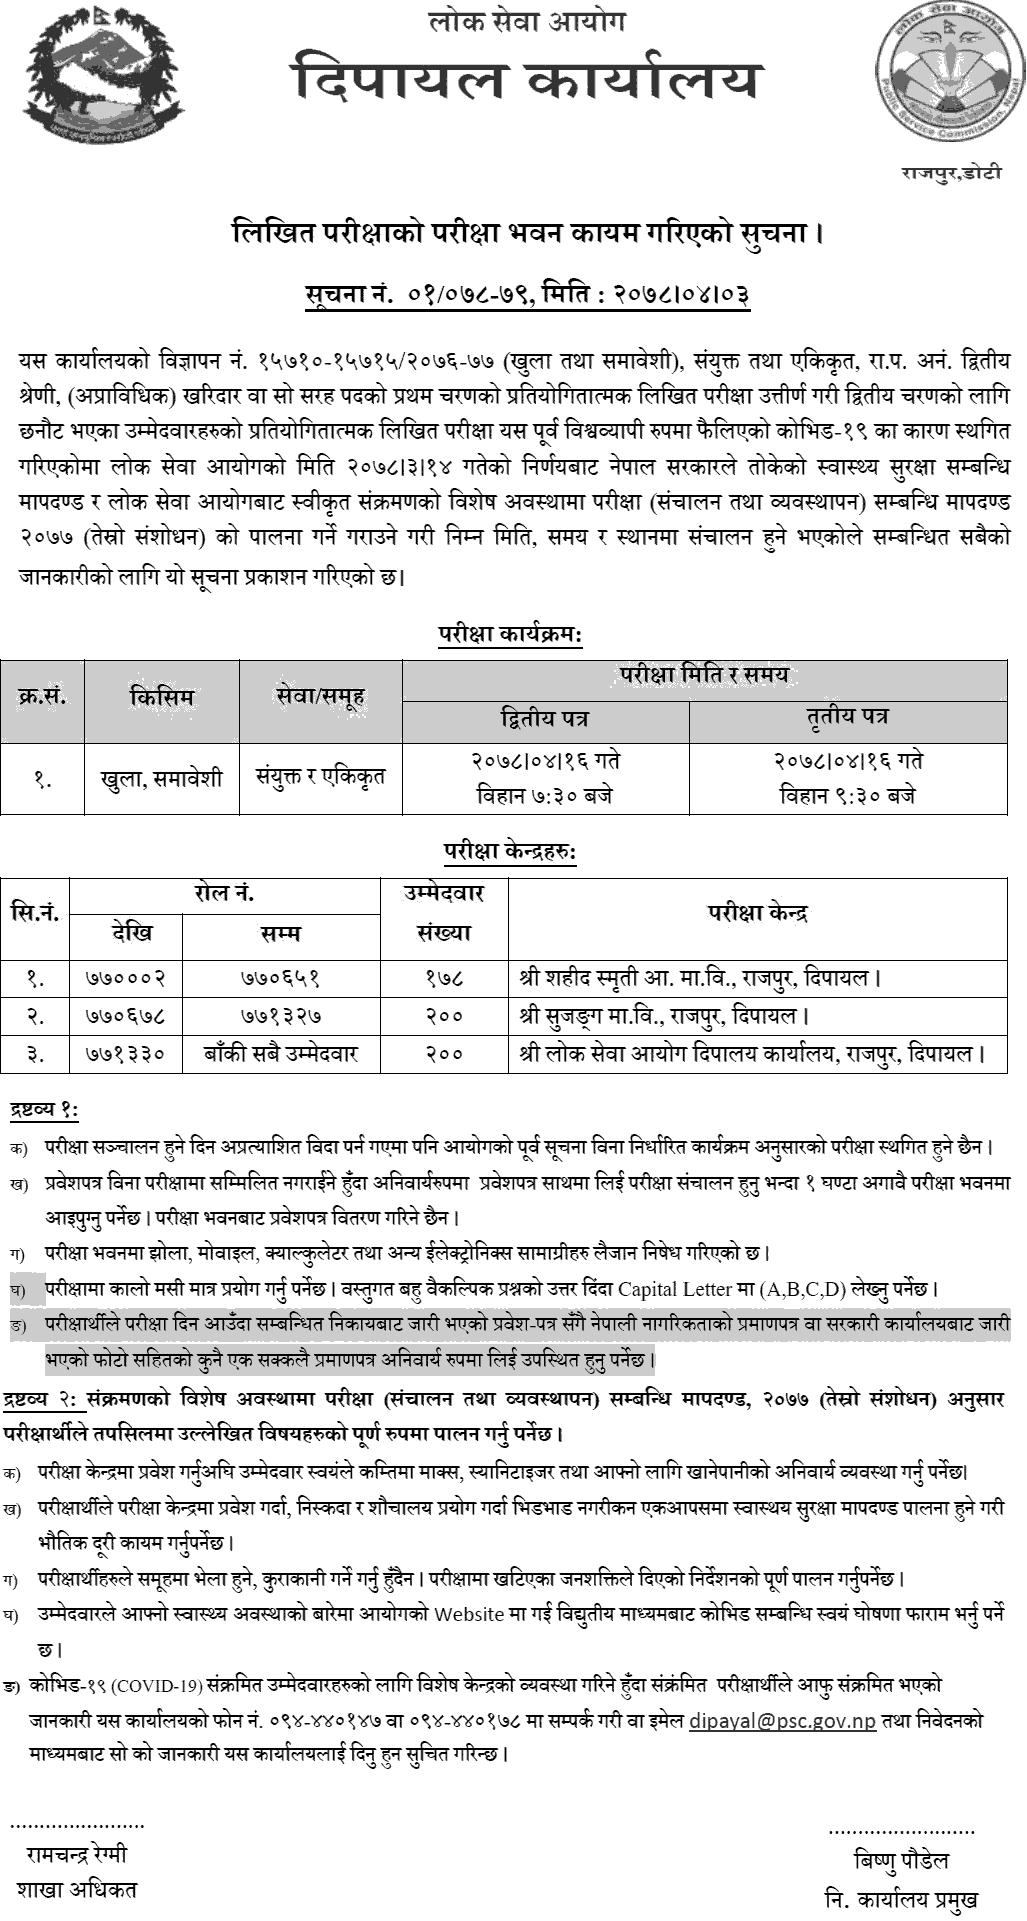 11) Lok Sewa Aayog Dhipayal (Kharidar Second Phase Written Exam Center)